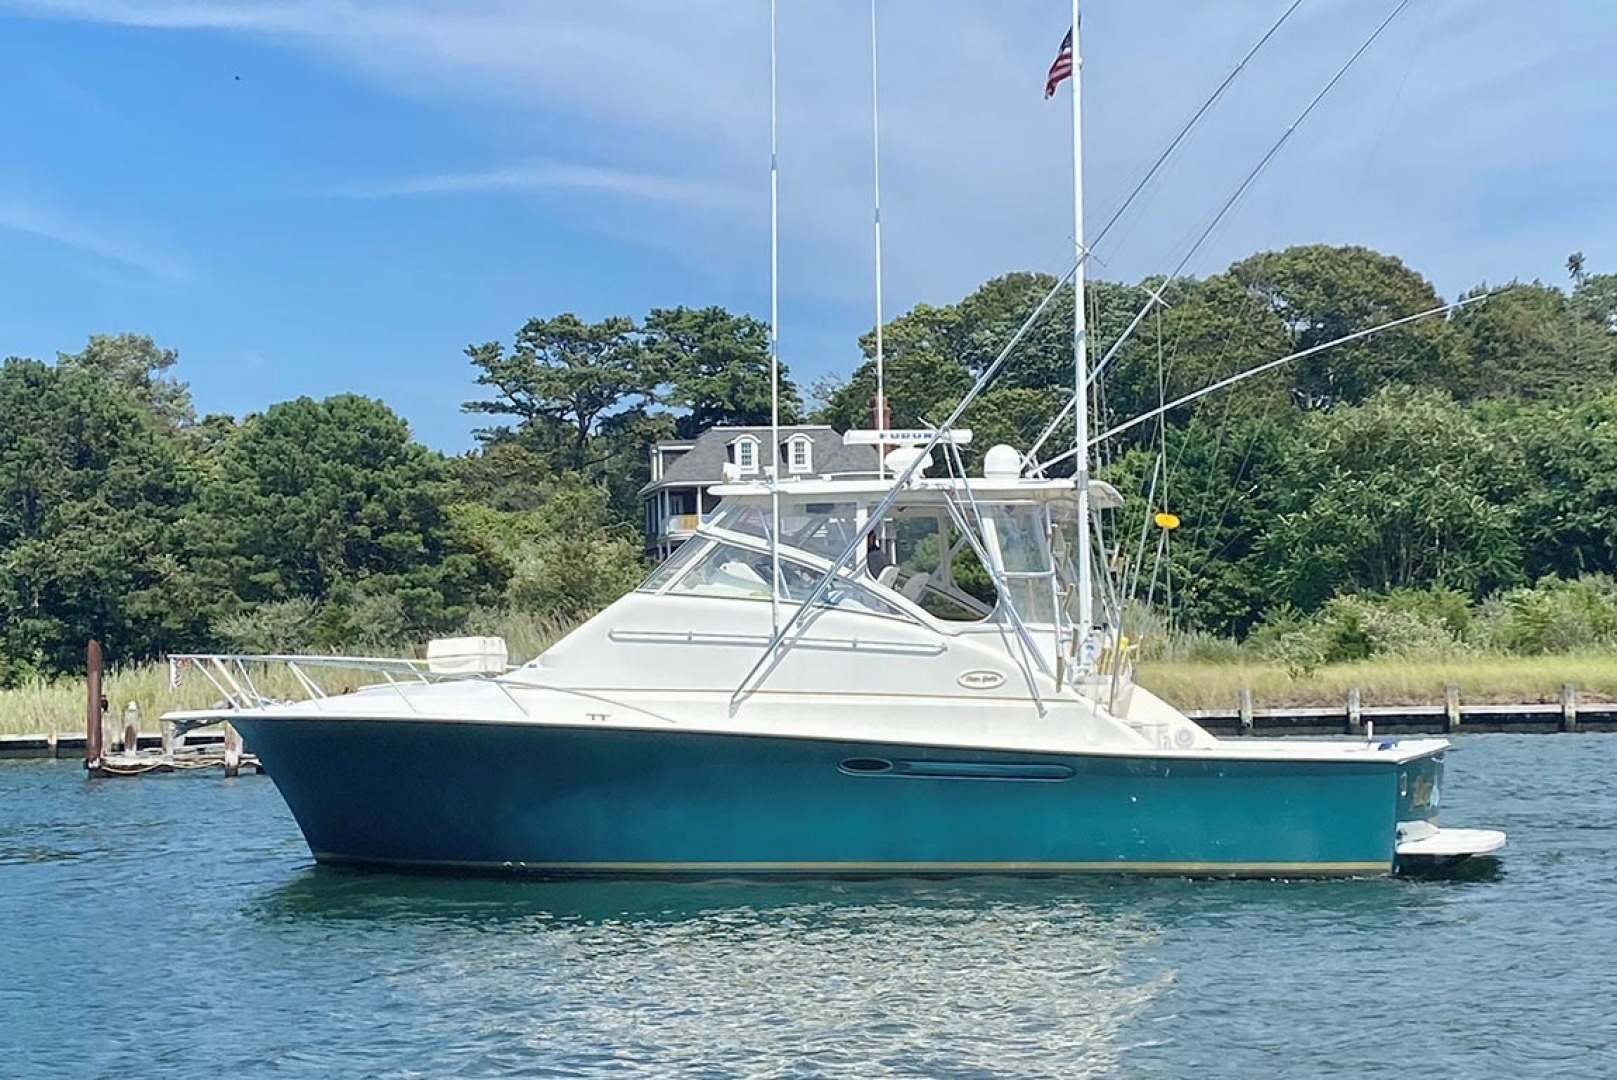 Ocean Yachts-40 Express 2001-Alexa Corinne Long Island-New York-United States-Port Profile-1470864 | Thumbnail